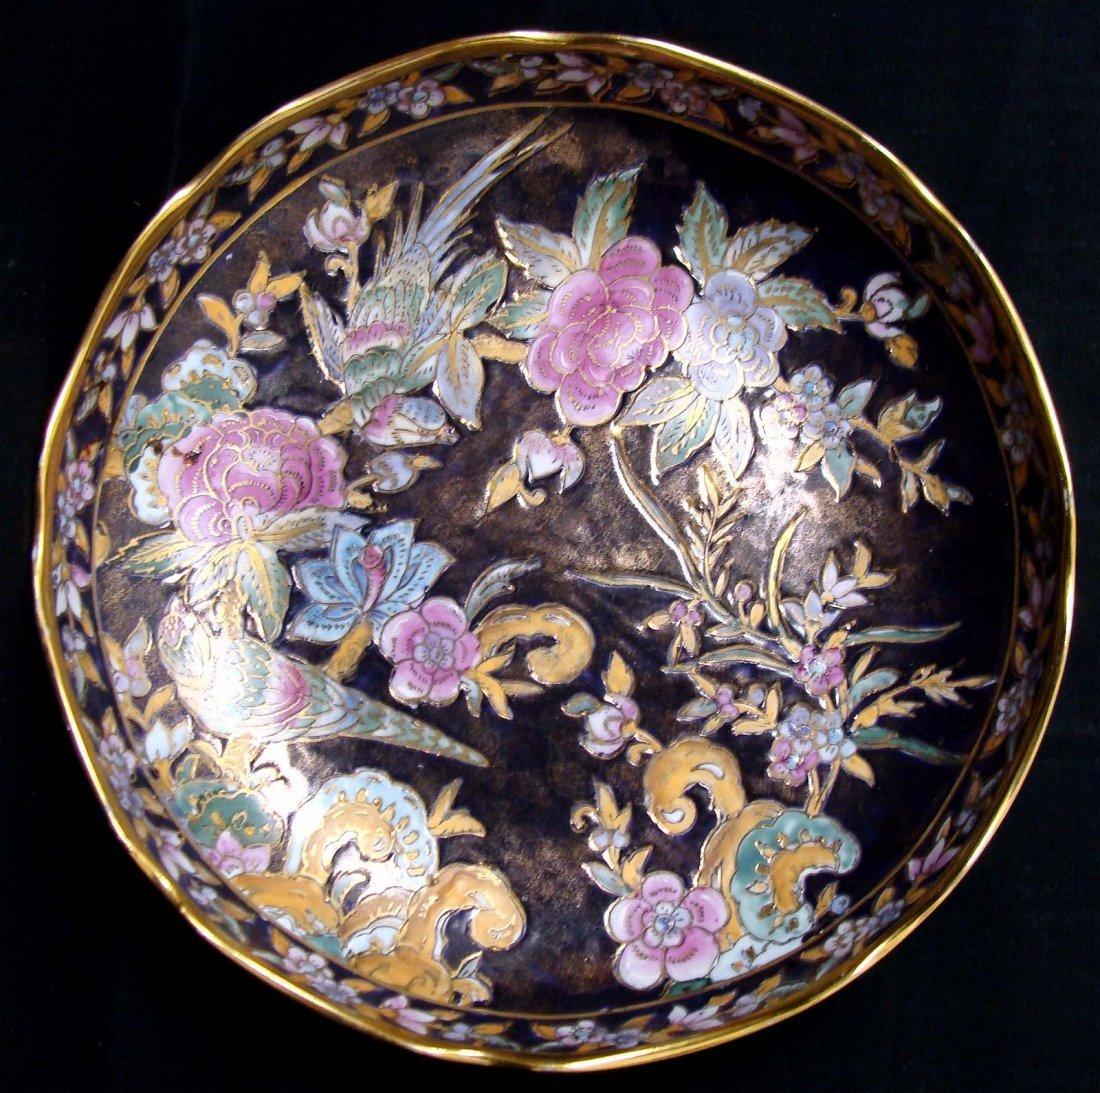 Chinese Cloissone Birds & Flowers on Black Bowl